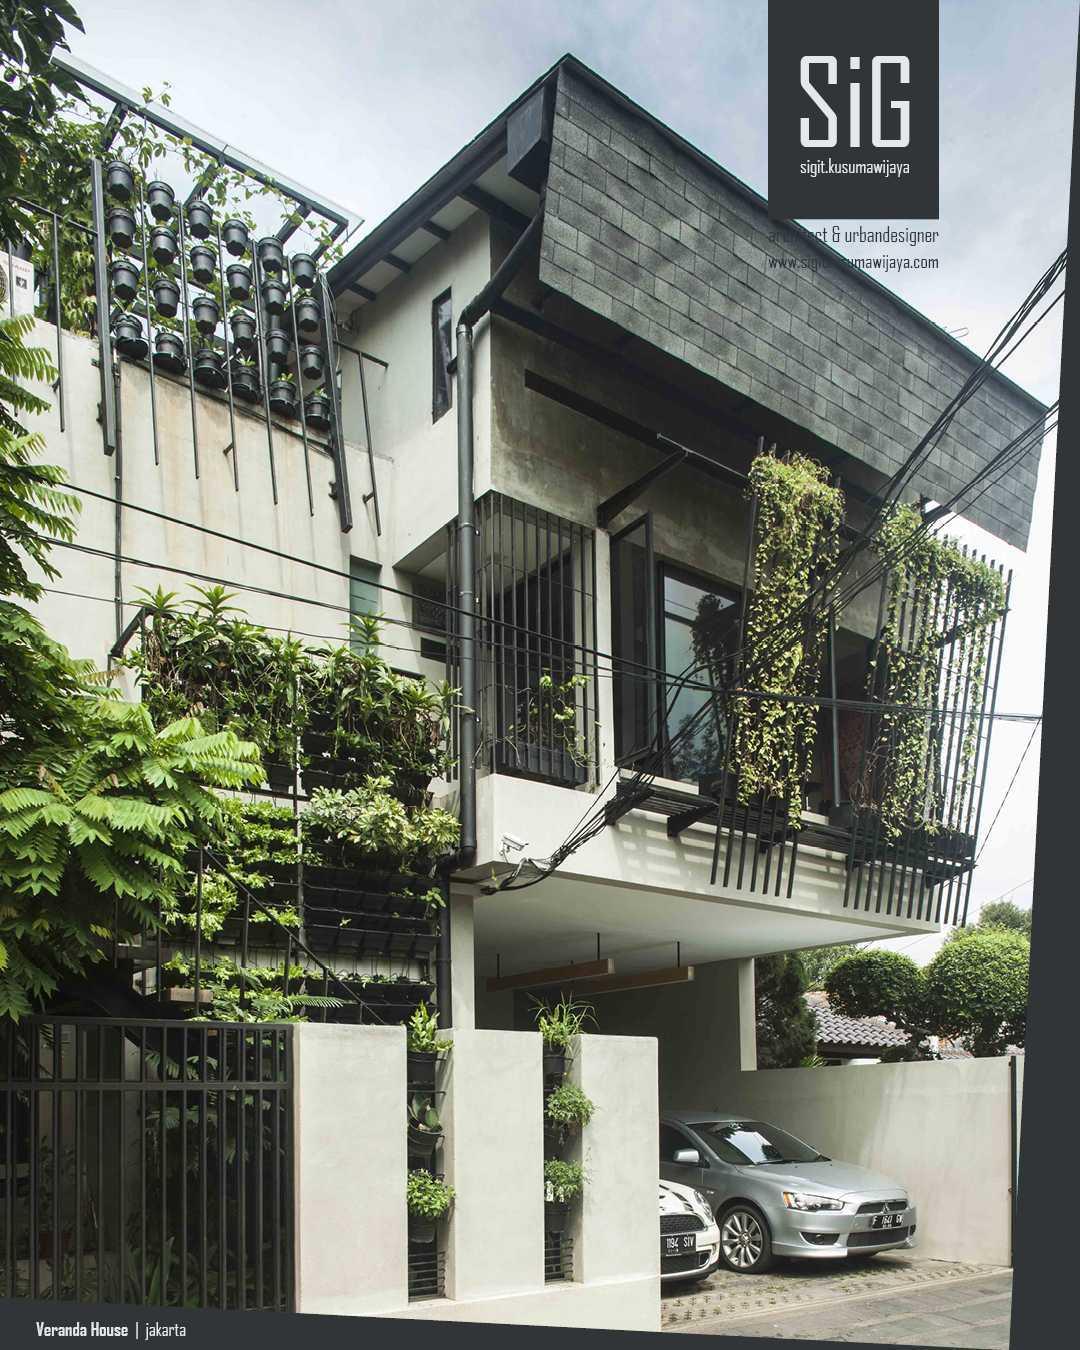 Sigit.kusumawijaya | Architect & Urbandesigner Rumah Beranda - Green Boarding House Cipete, South Jakarta, Indonesia Cipete, South Jakarta, Indonesia Sigitkusumawijaya-Architect-Urbandesigner-Rumah-Beranda-Green-Boarding-House Industrial 54997